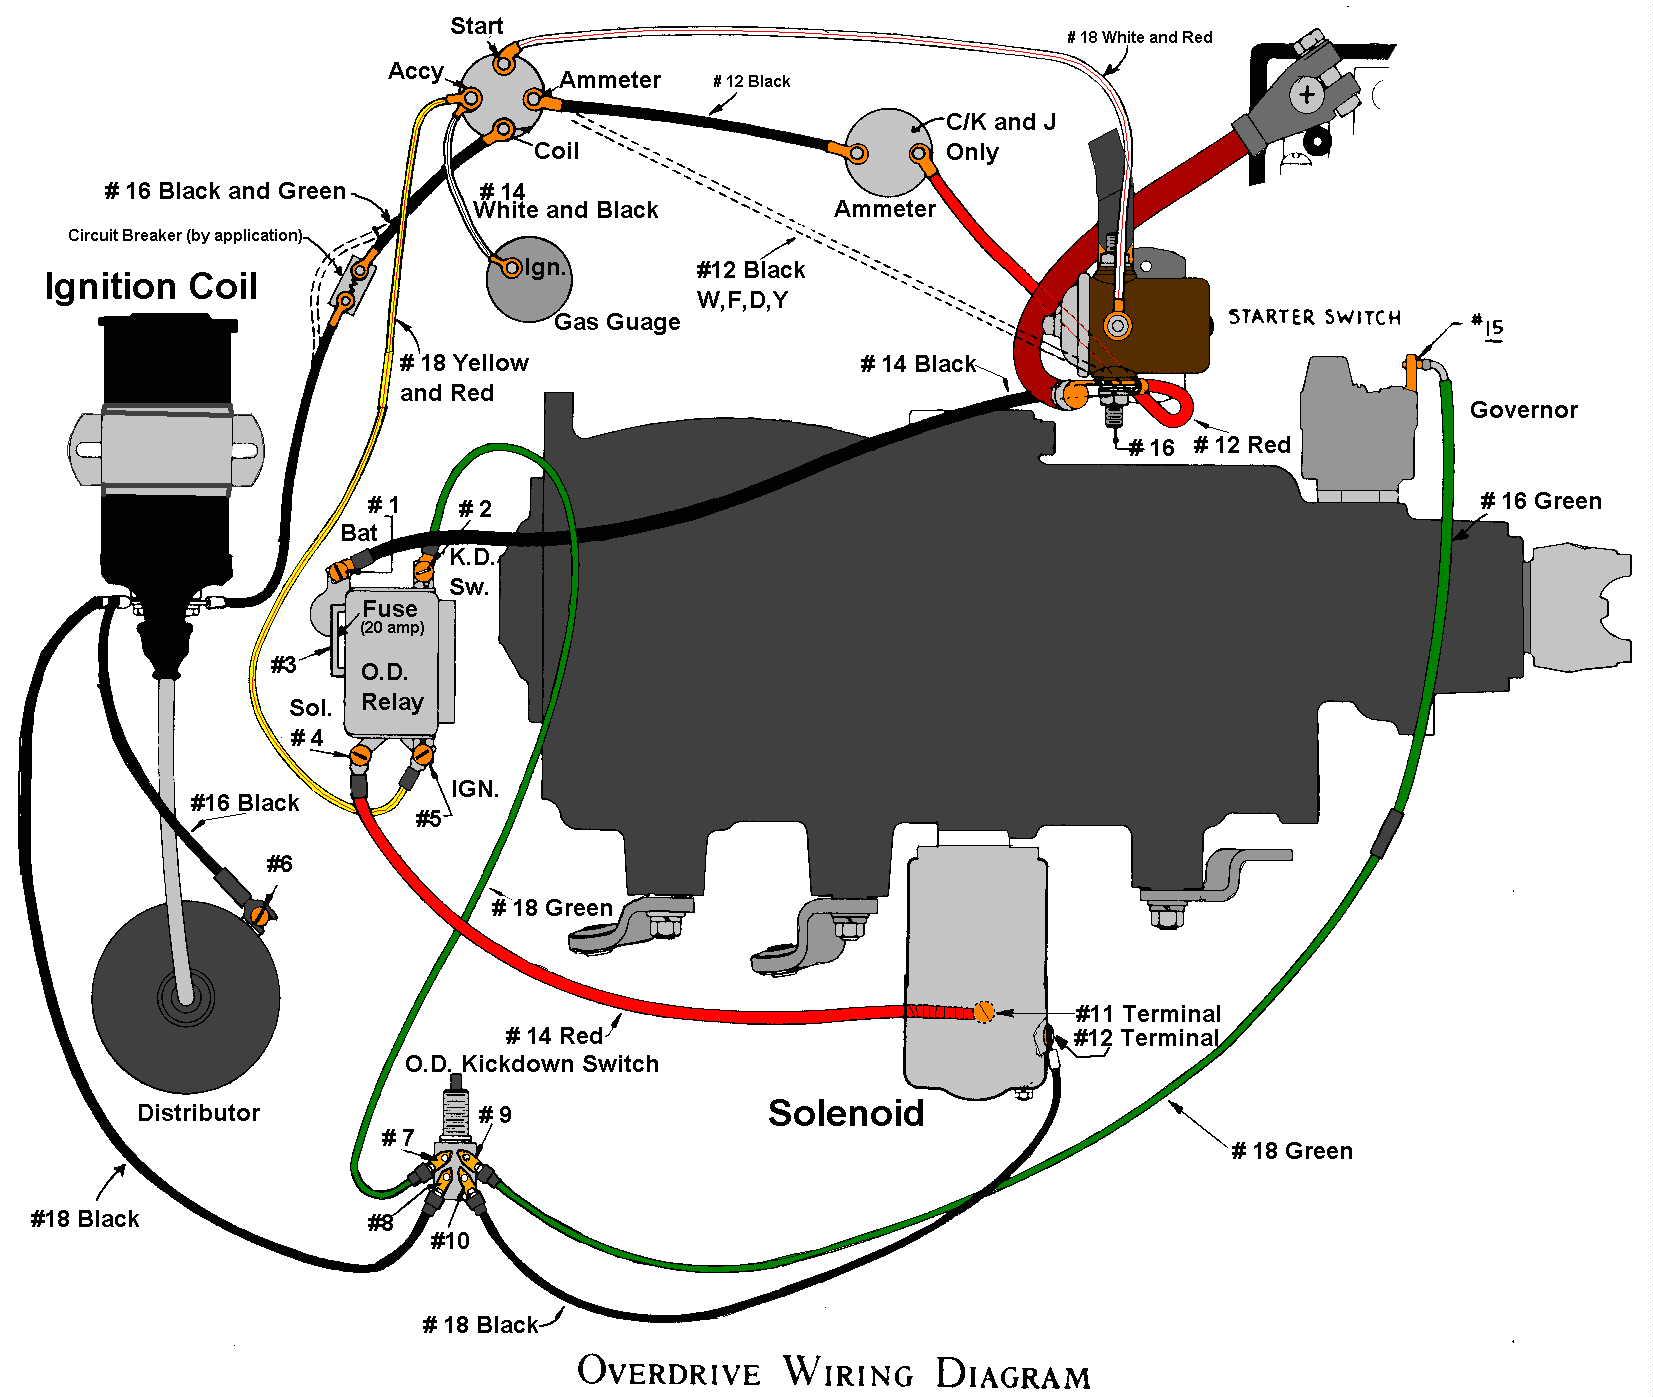 Peachy Gm 4L30E Diagram Wiring Diagram Tutorial Wiring Digital Resources Almabapapkbiperorg